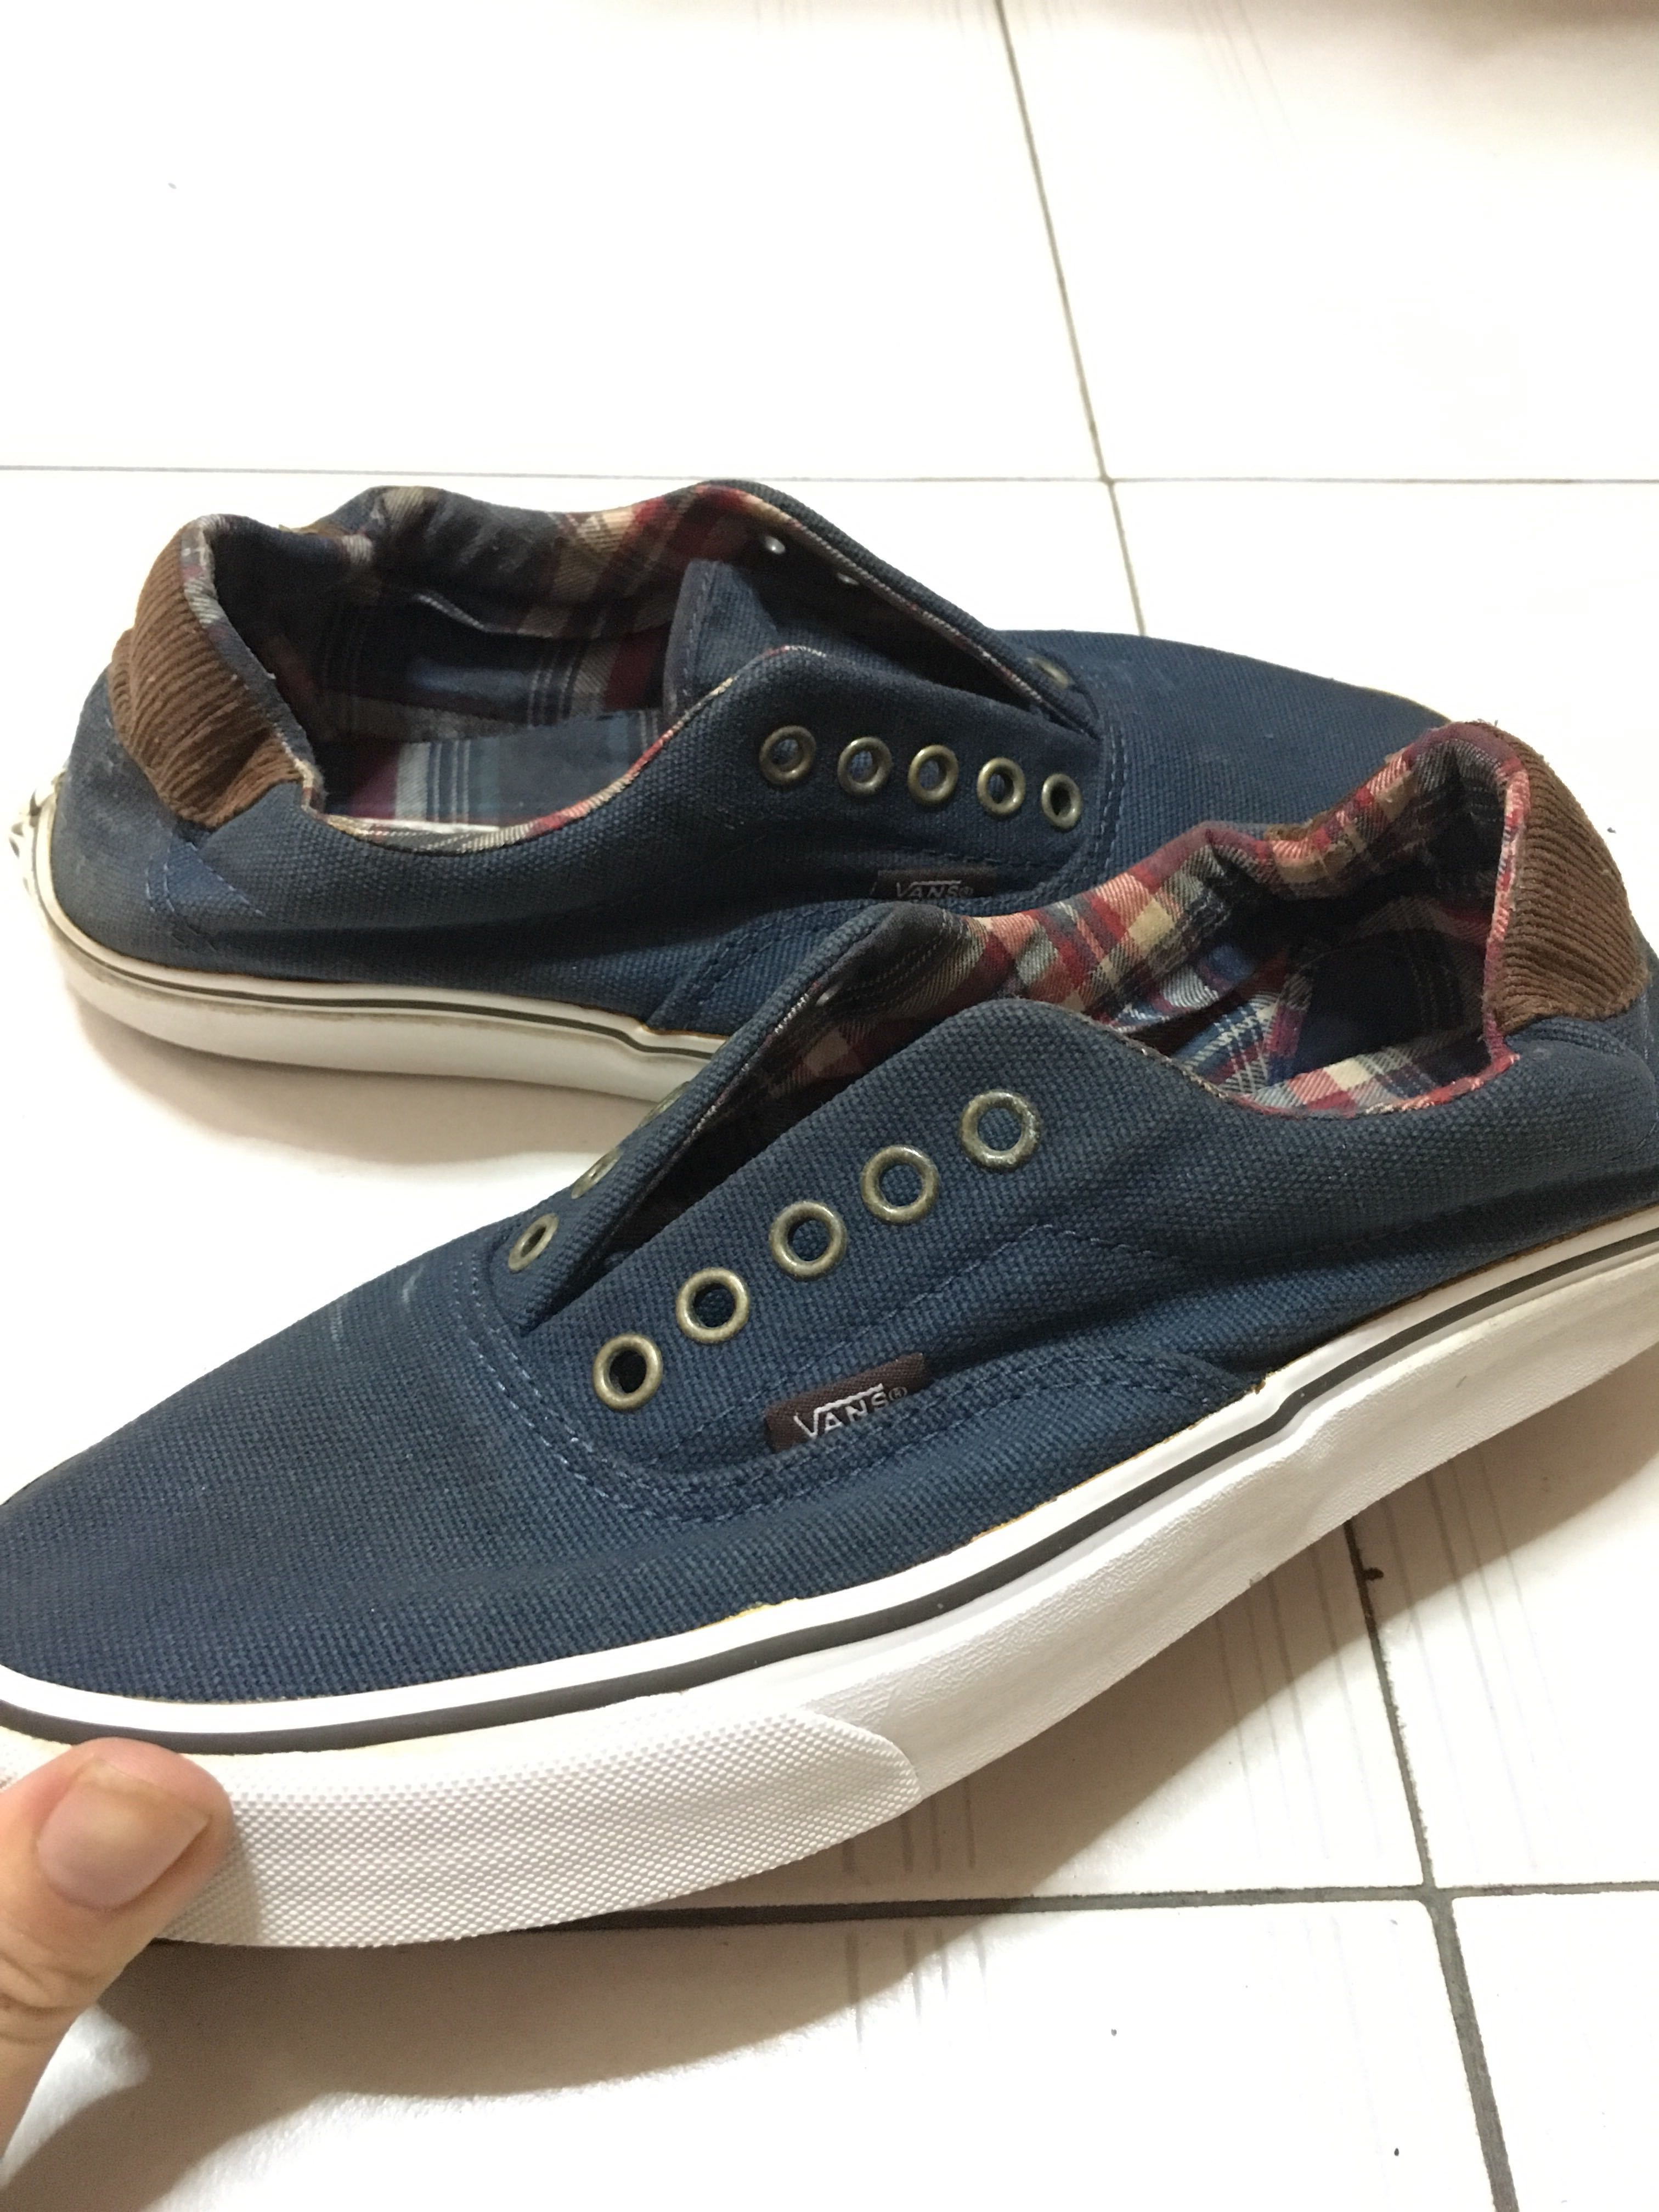 58df9899079045 Home · Men s Fashion · Footwear · Sneakers. photo photo photo photo photo